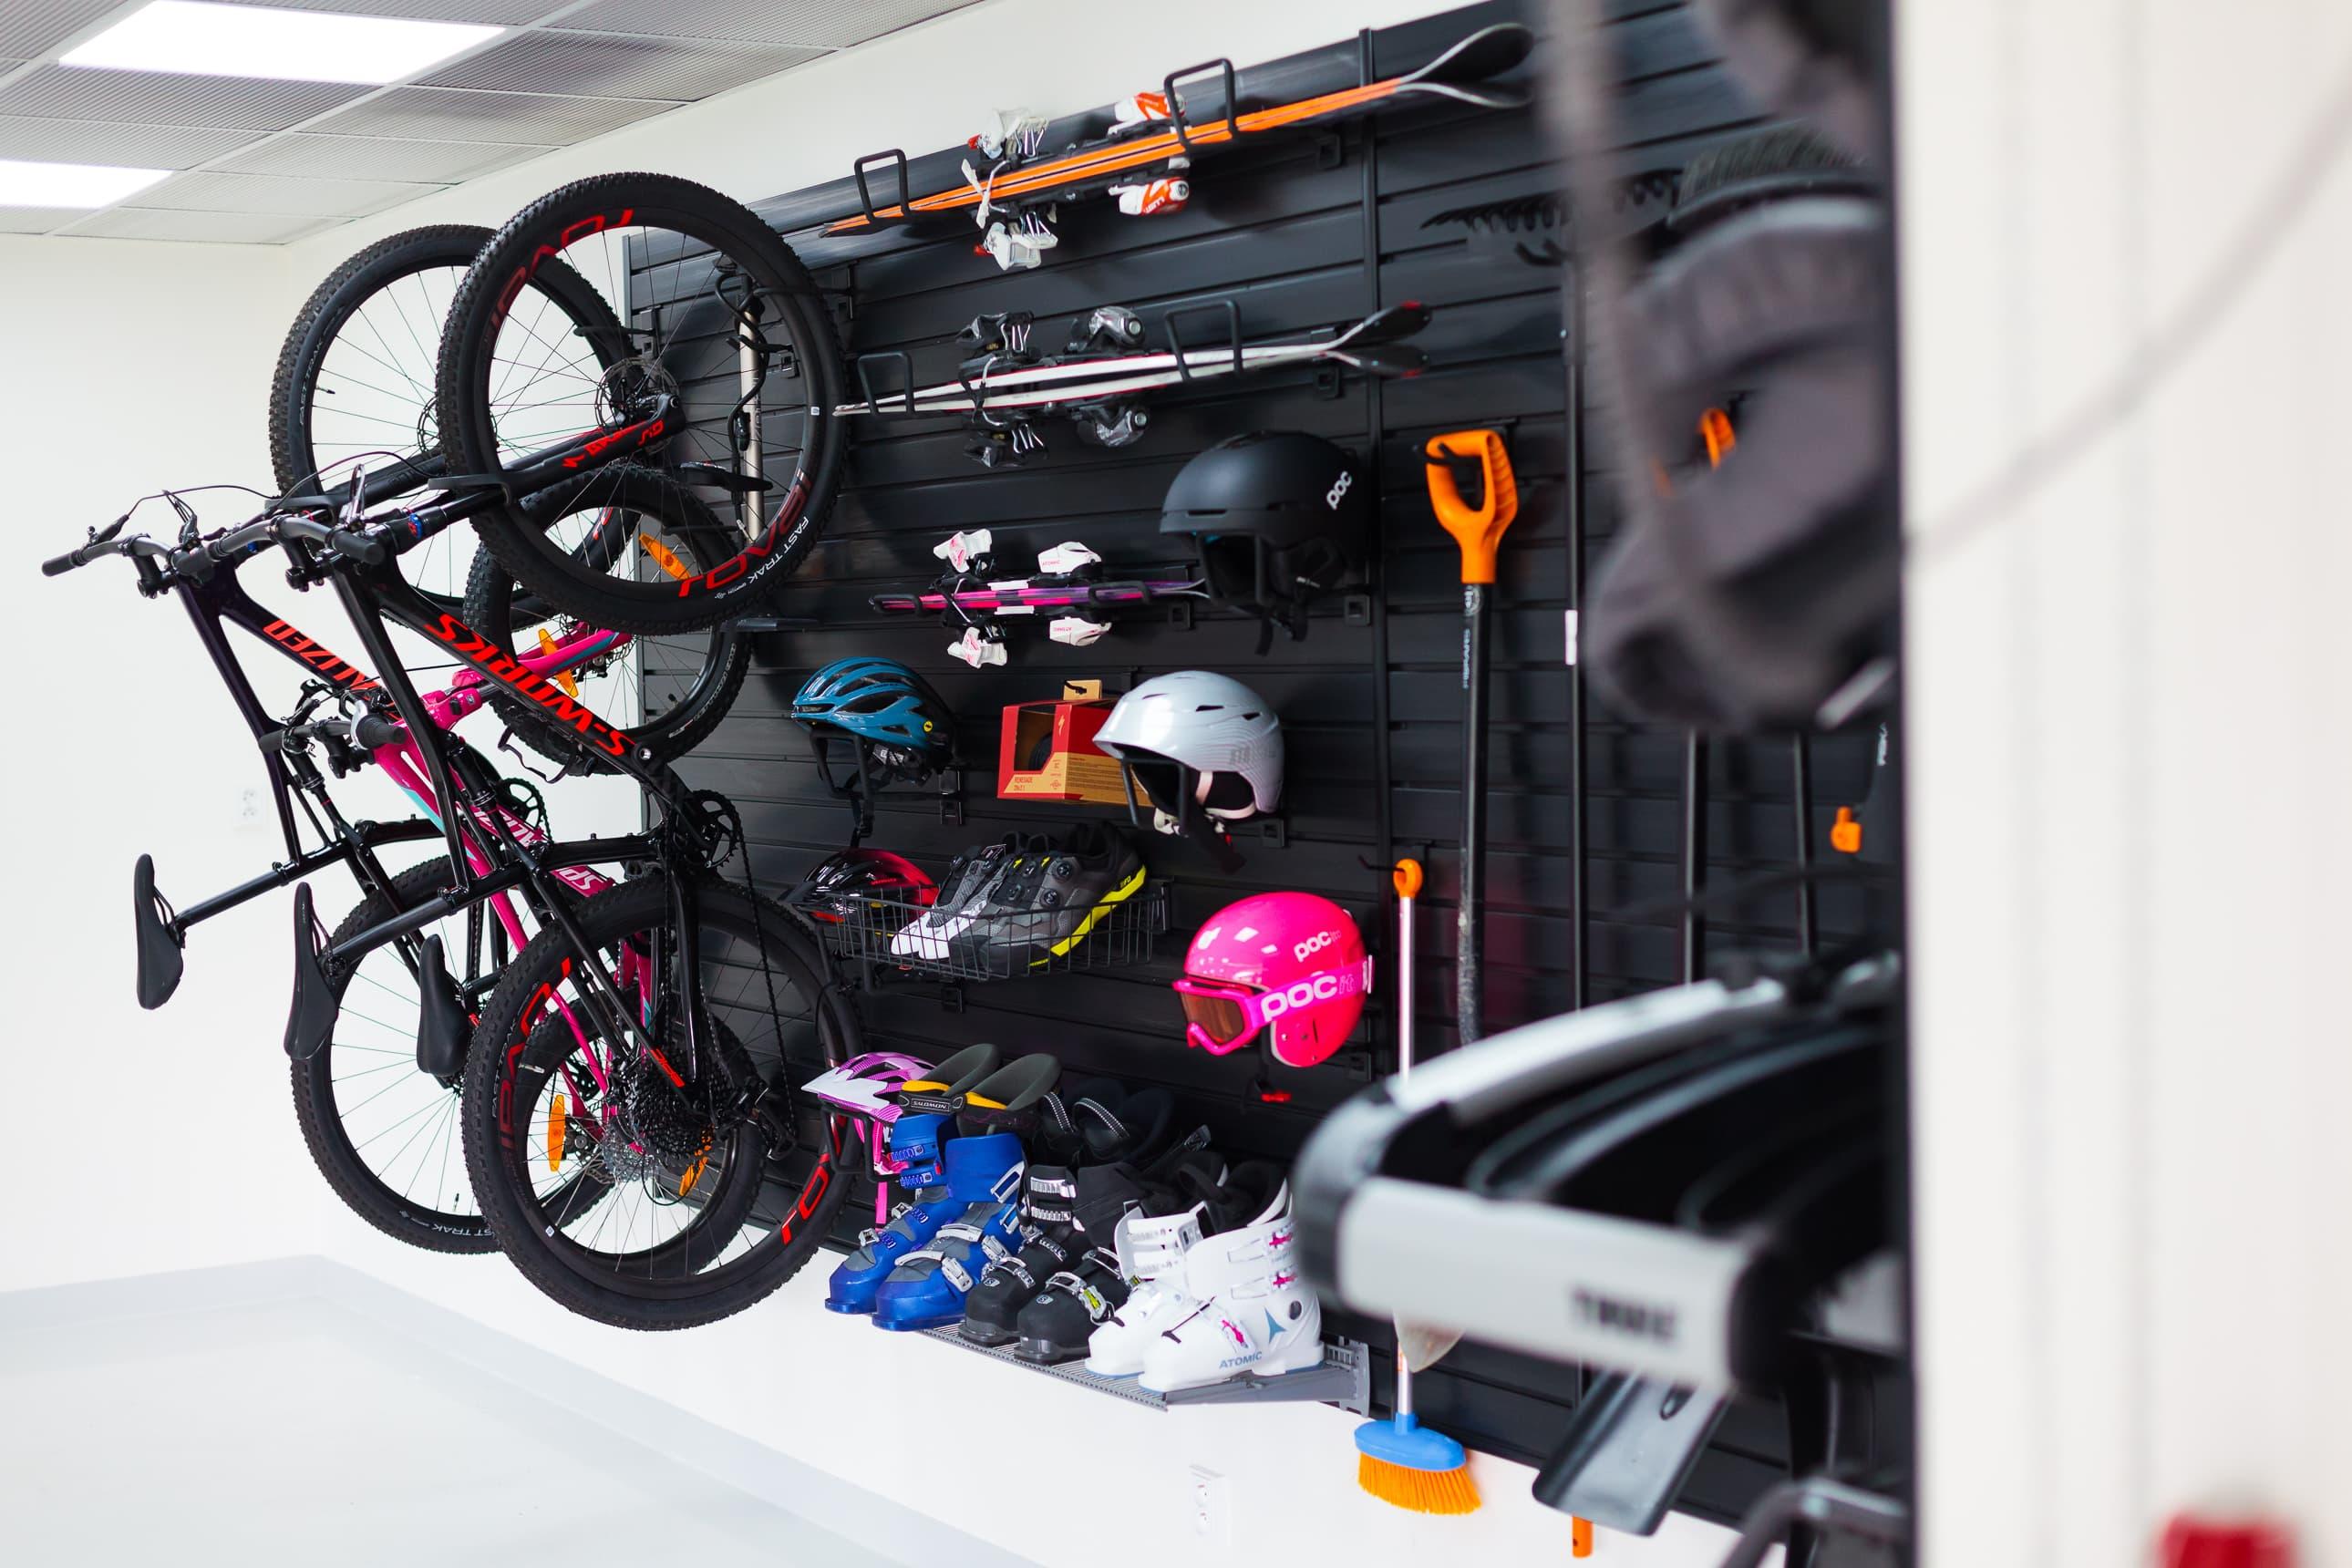 ulozny-system-garaz